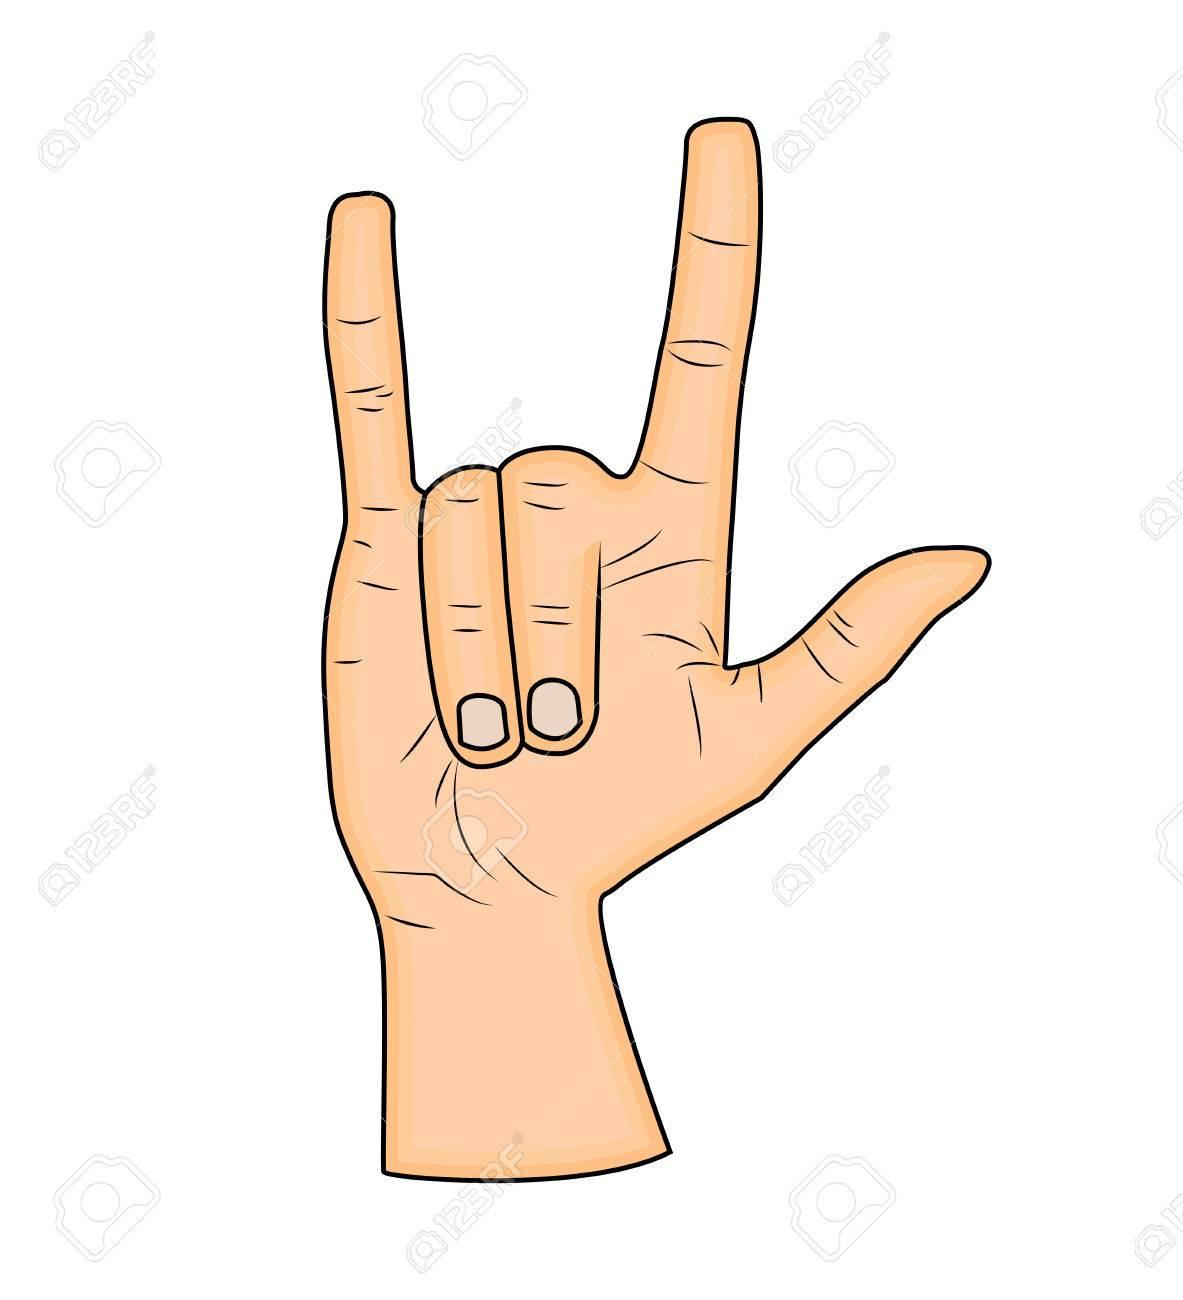 Horns hand satan sign finger up gesture vector isolated on horns hand satan sign finger up gesture vector isolated on white background realistic biocorpaavc Choice Image